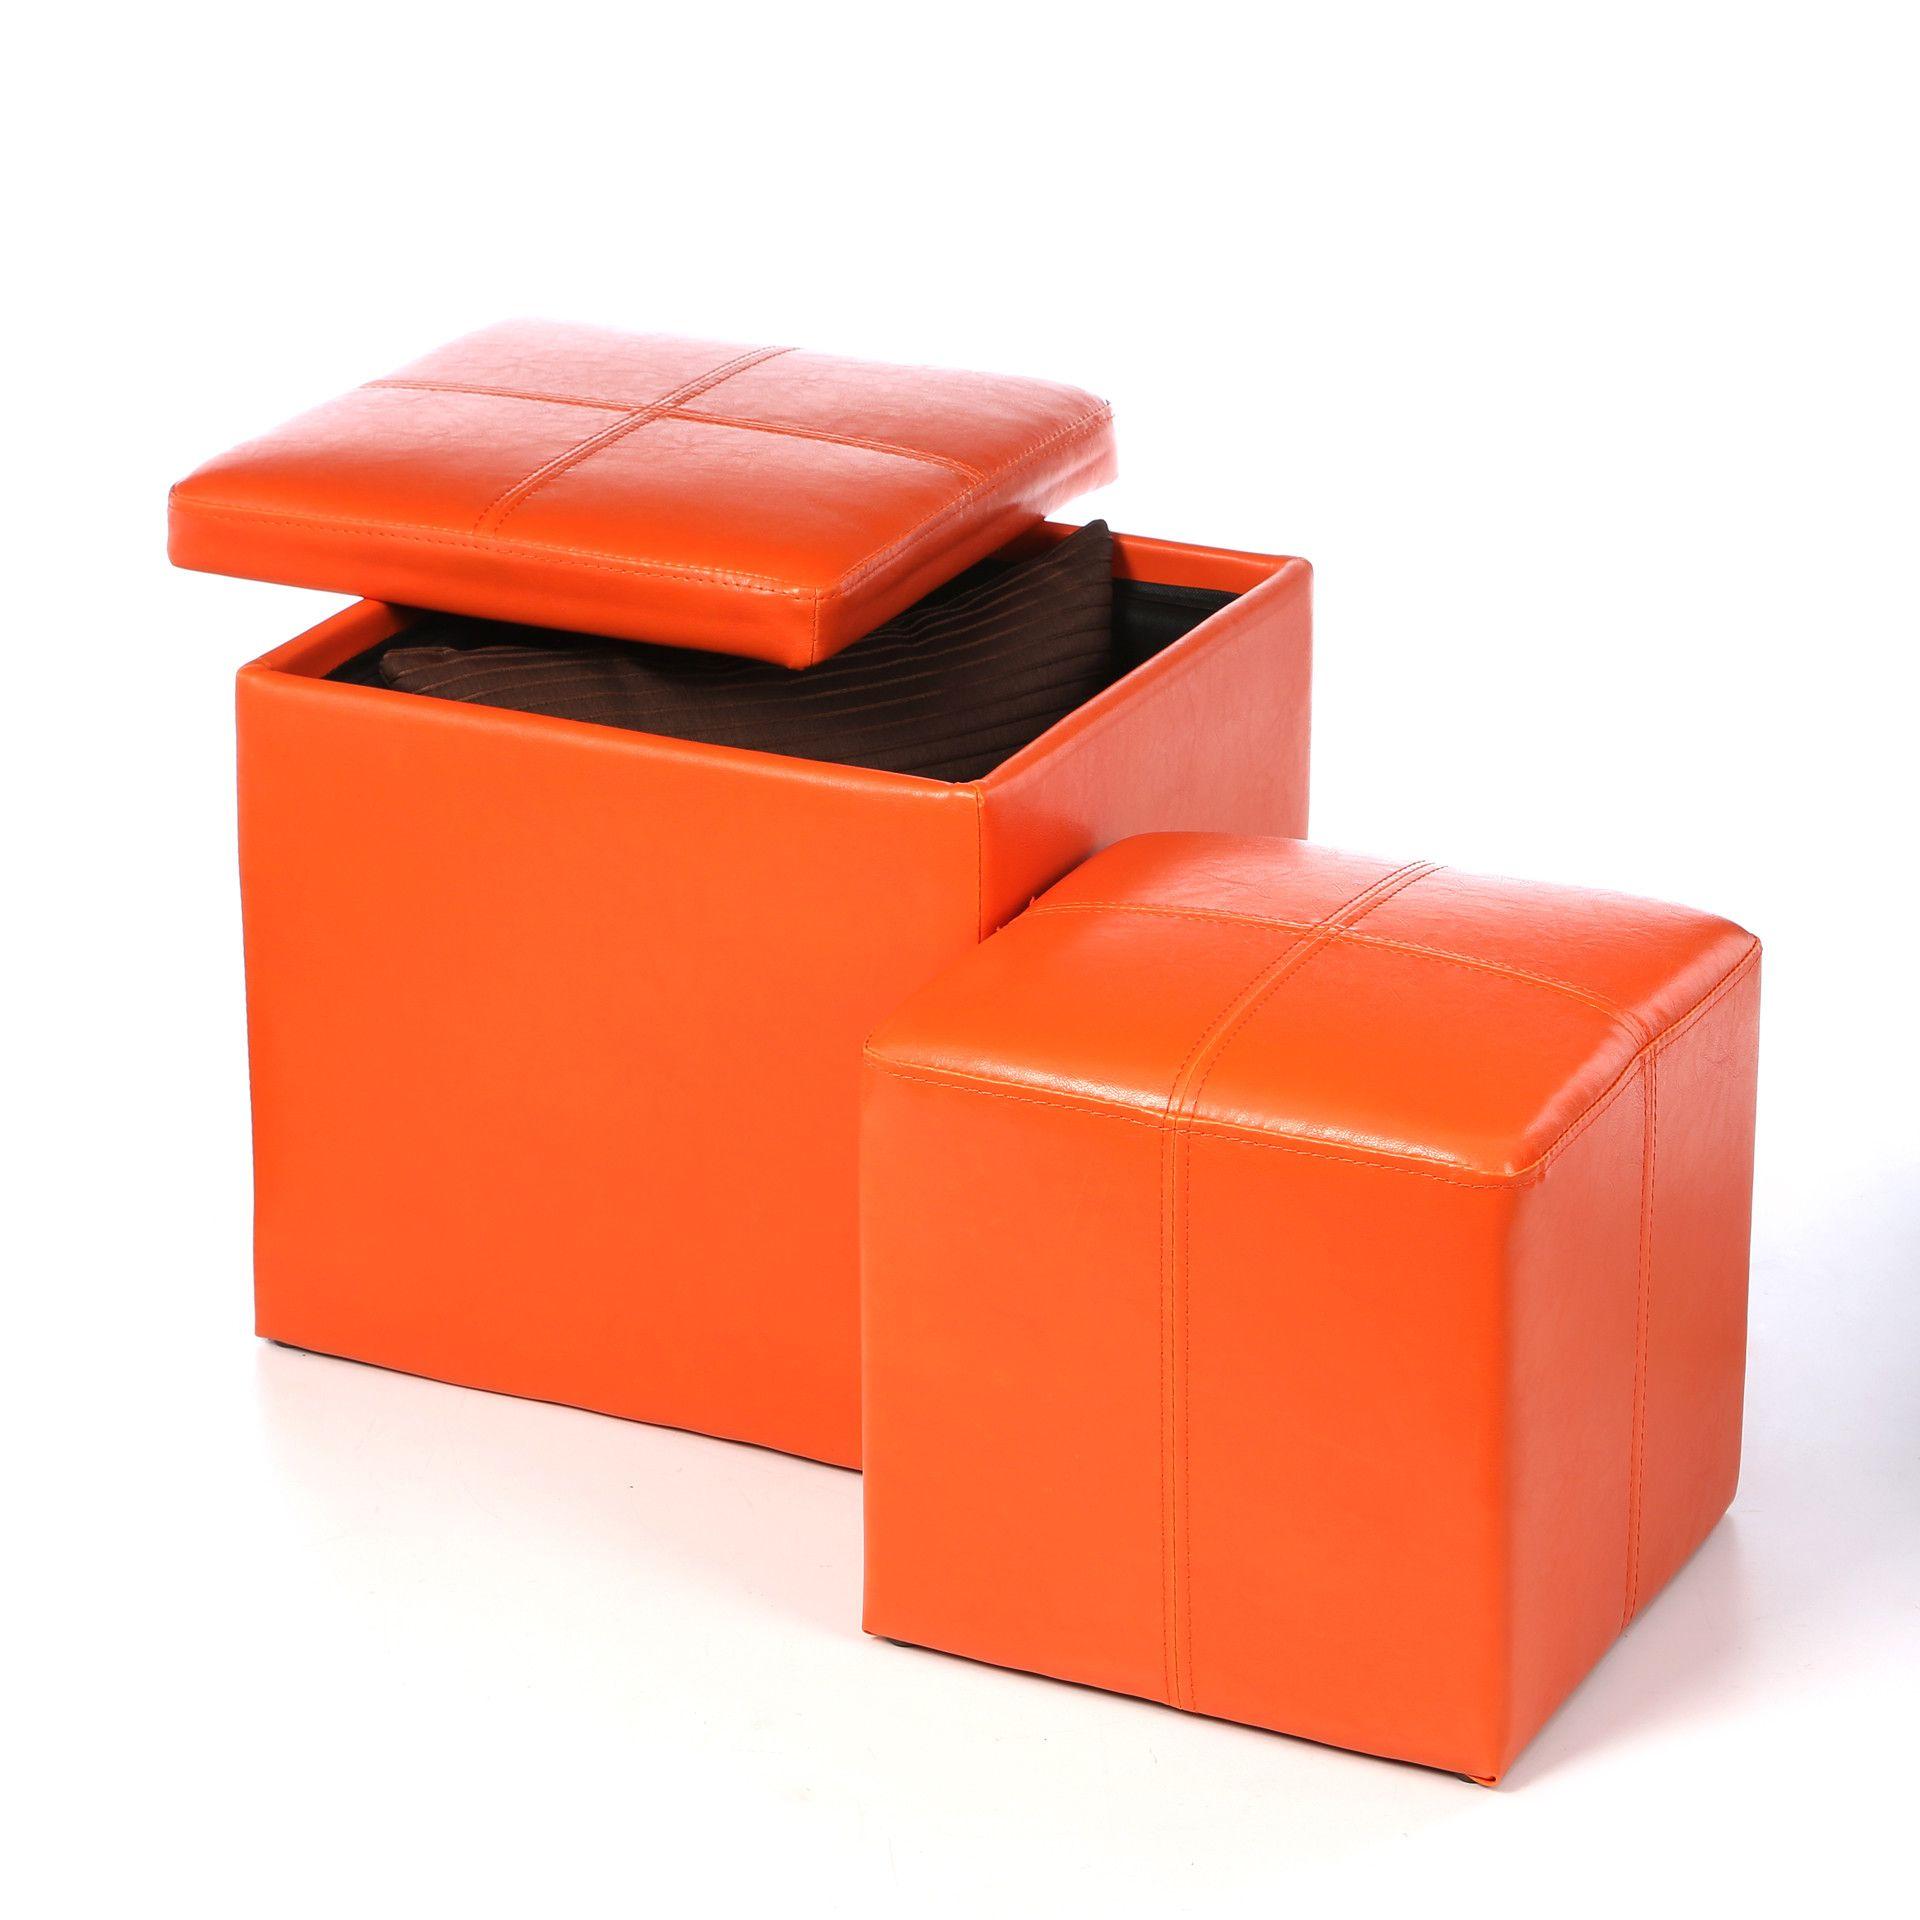 Woodbridge Home Designs 4723 Series Cube Ottoman & Reviews | Wayfair - $62.99